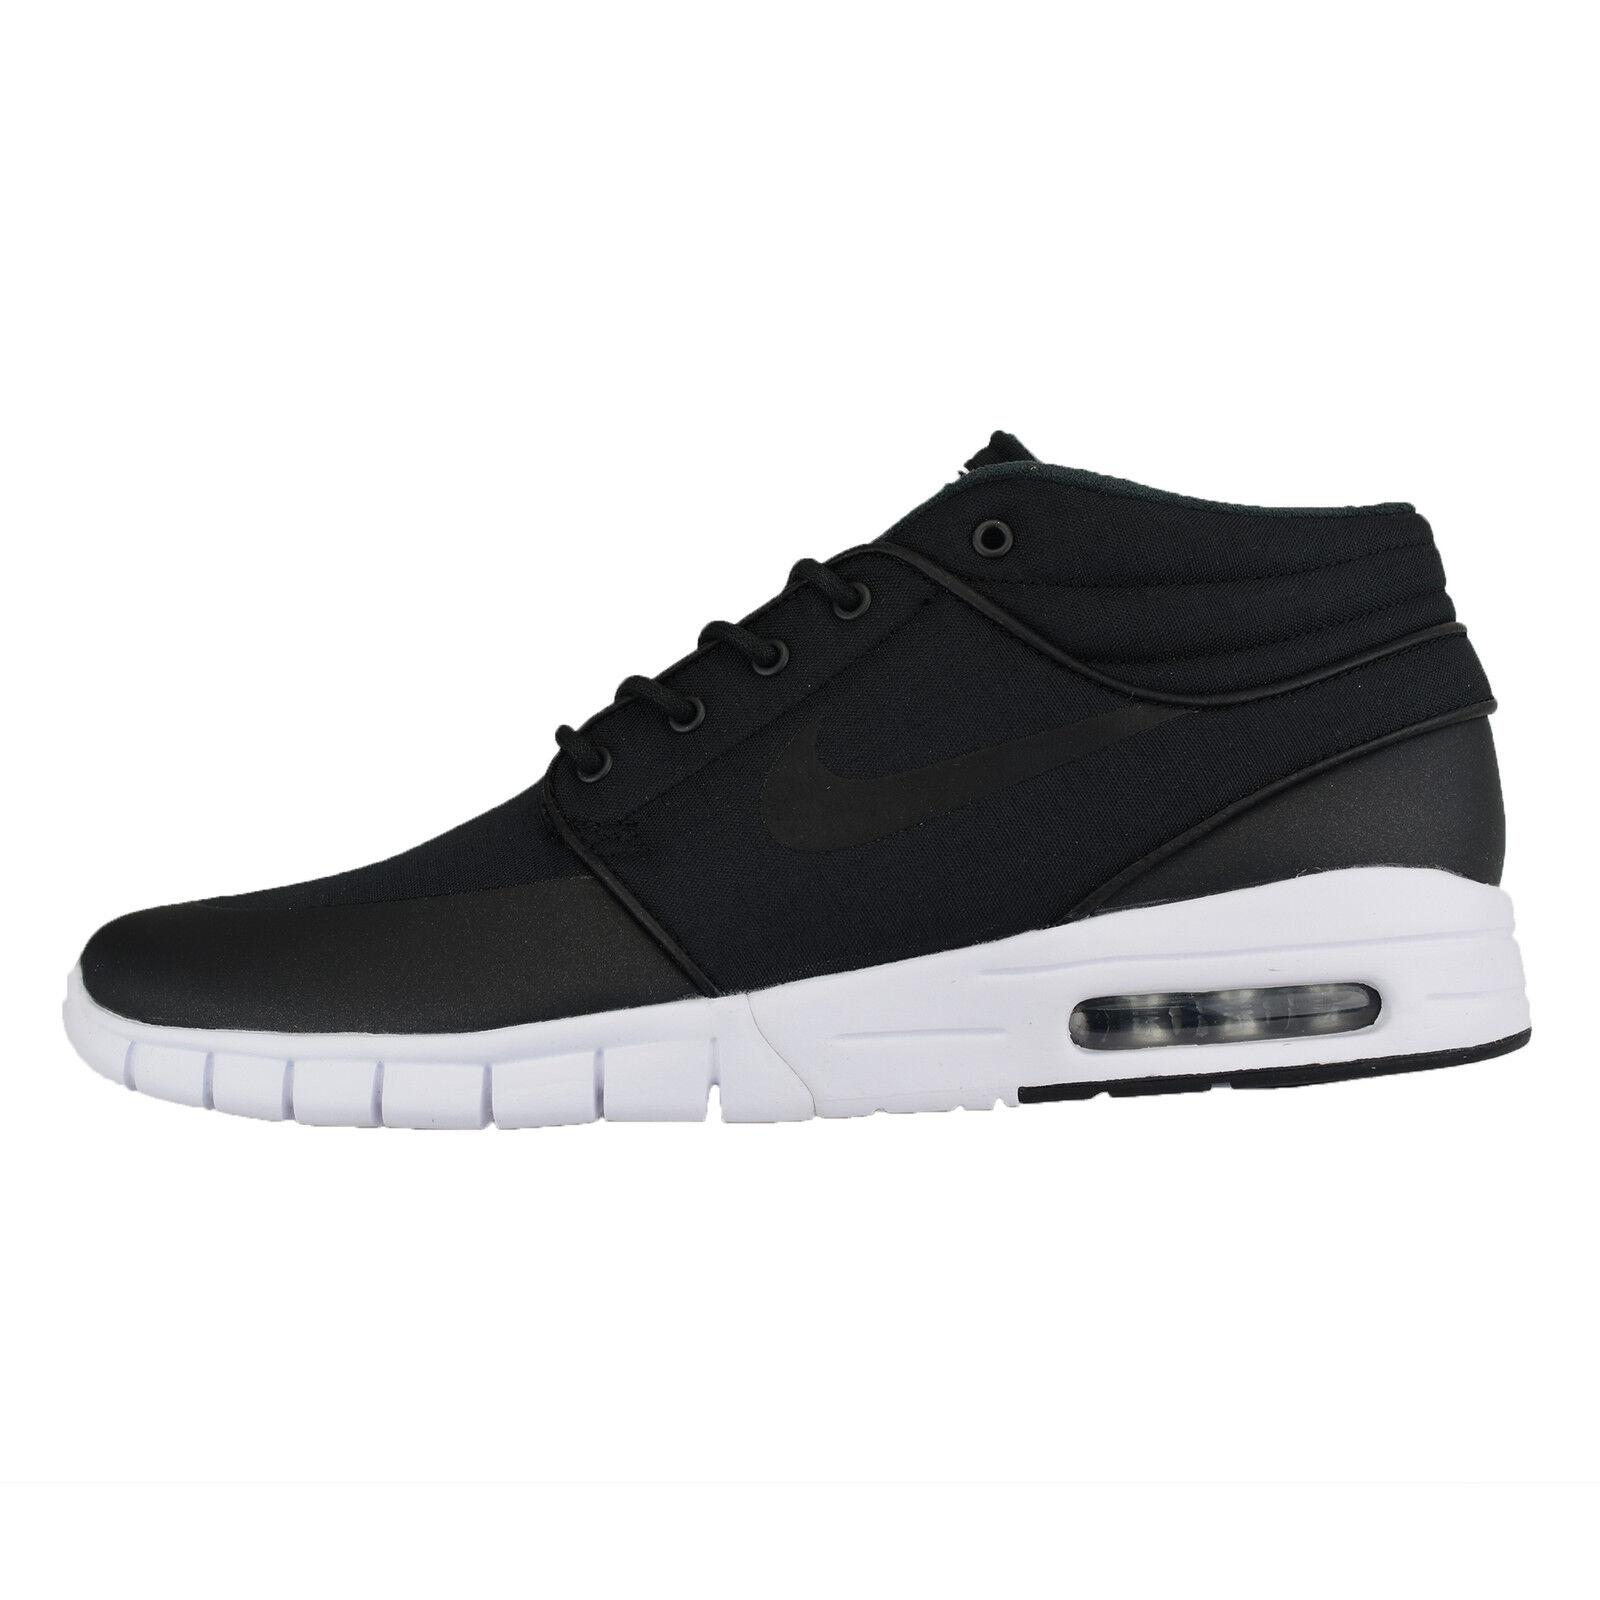 Nike Zoom Stefan Janoski MAX MID 807507-001 Skateboard Lifestyle Shoes Trainers